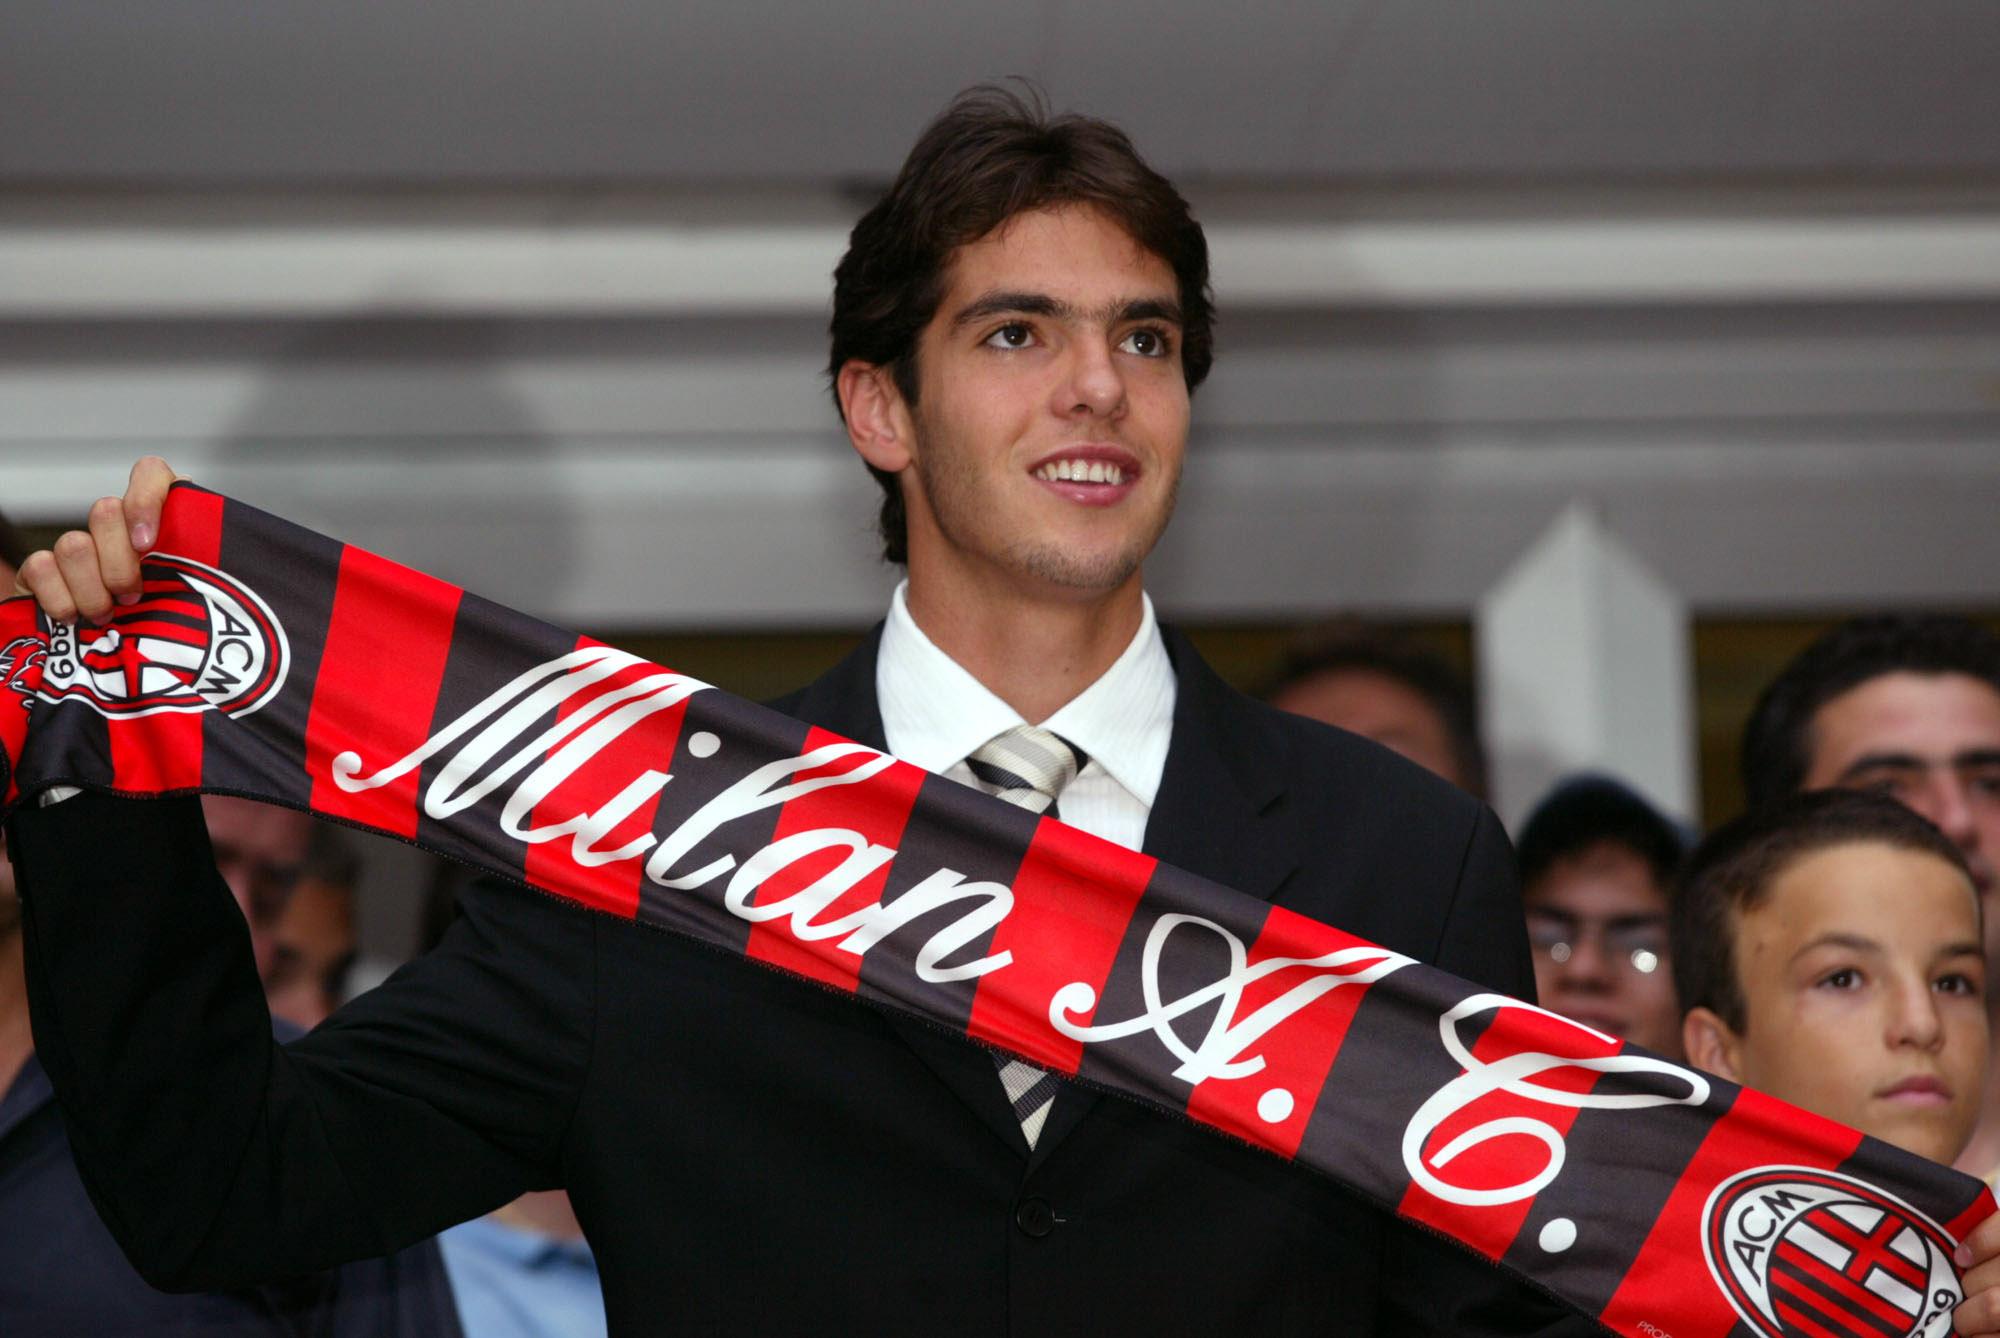 El brasileño retornará a San Siro